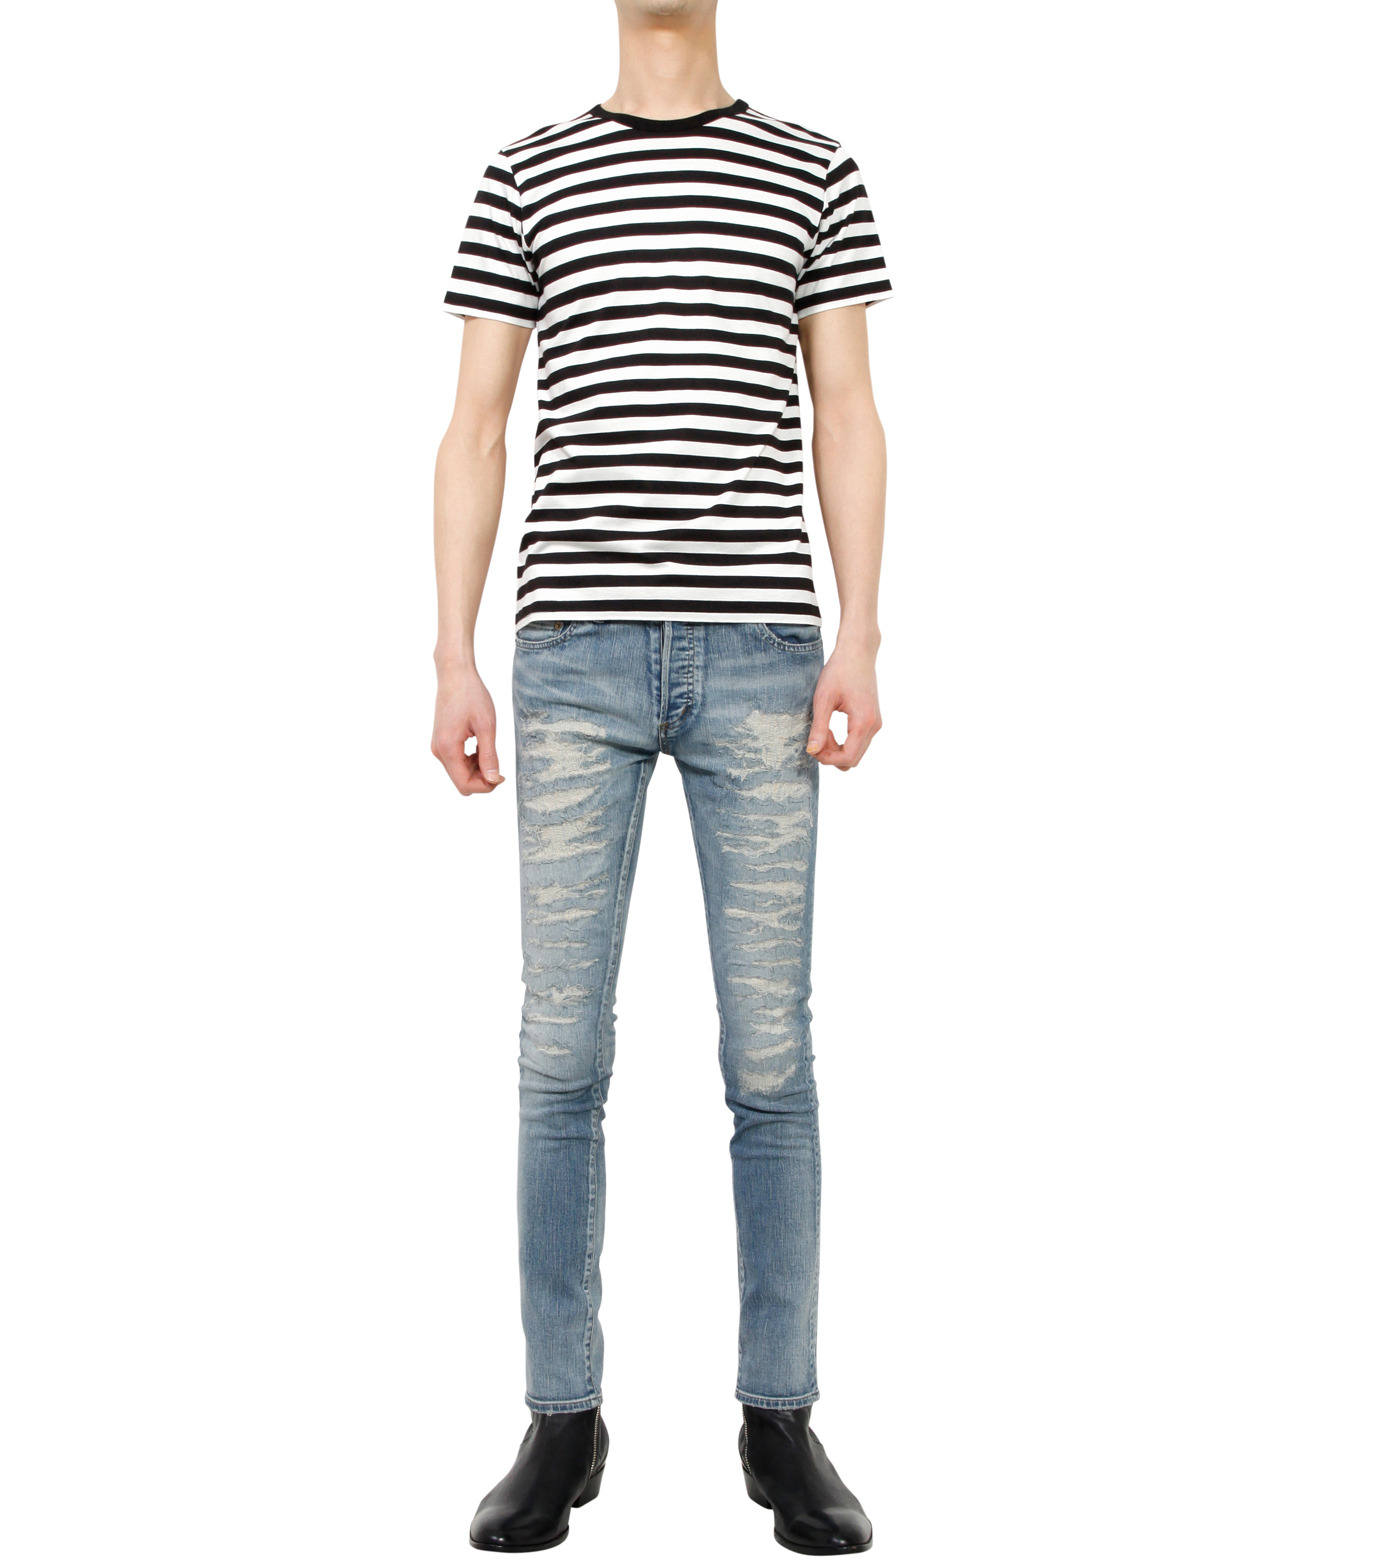 HL HEDDIE LOVU(エイチエル・エディールーヴ)のind damage3 skin slim-BLUE(パンツ/pants)-18S98002-92 拡大詳細画像3